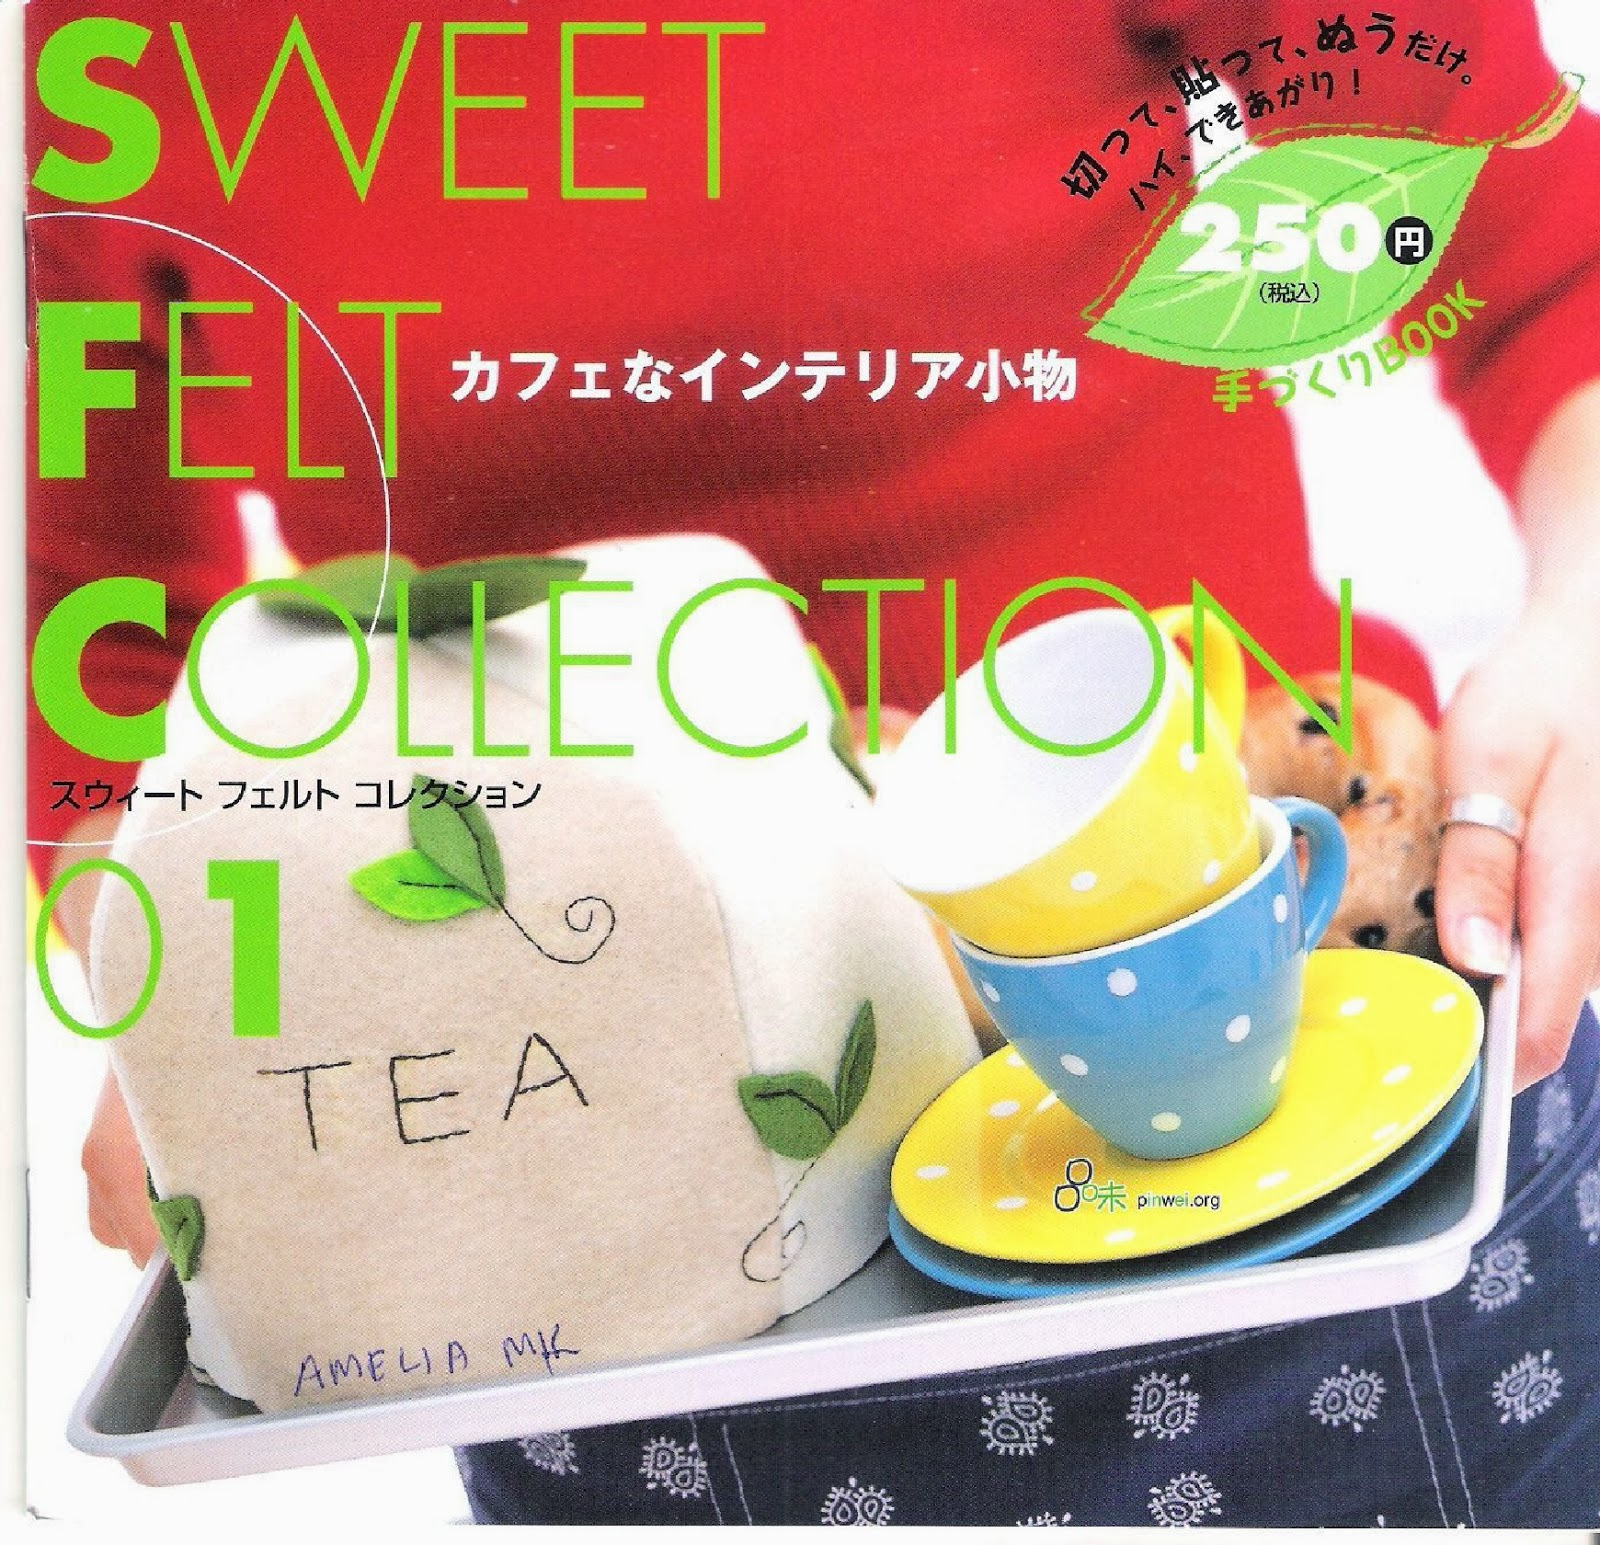 Felt craft book - Buku Ini Adalah Edisi Pertama Dari Seri Buku Sweet Felt Collection Dalam Buku Ini Kita Dapat Belajar Cara Membuat Pot Kecil Untuk Kaktus Tempat Cincin